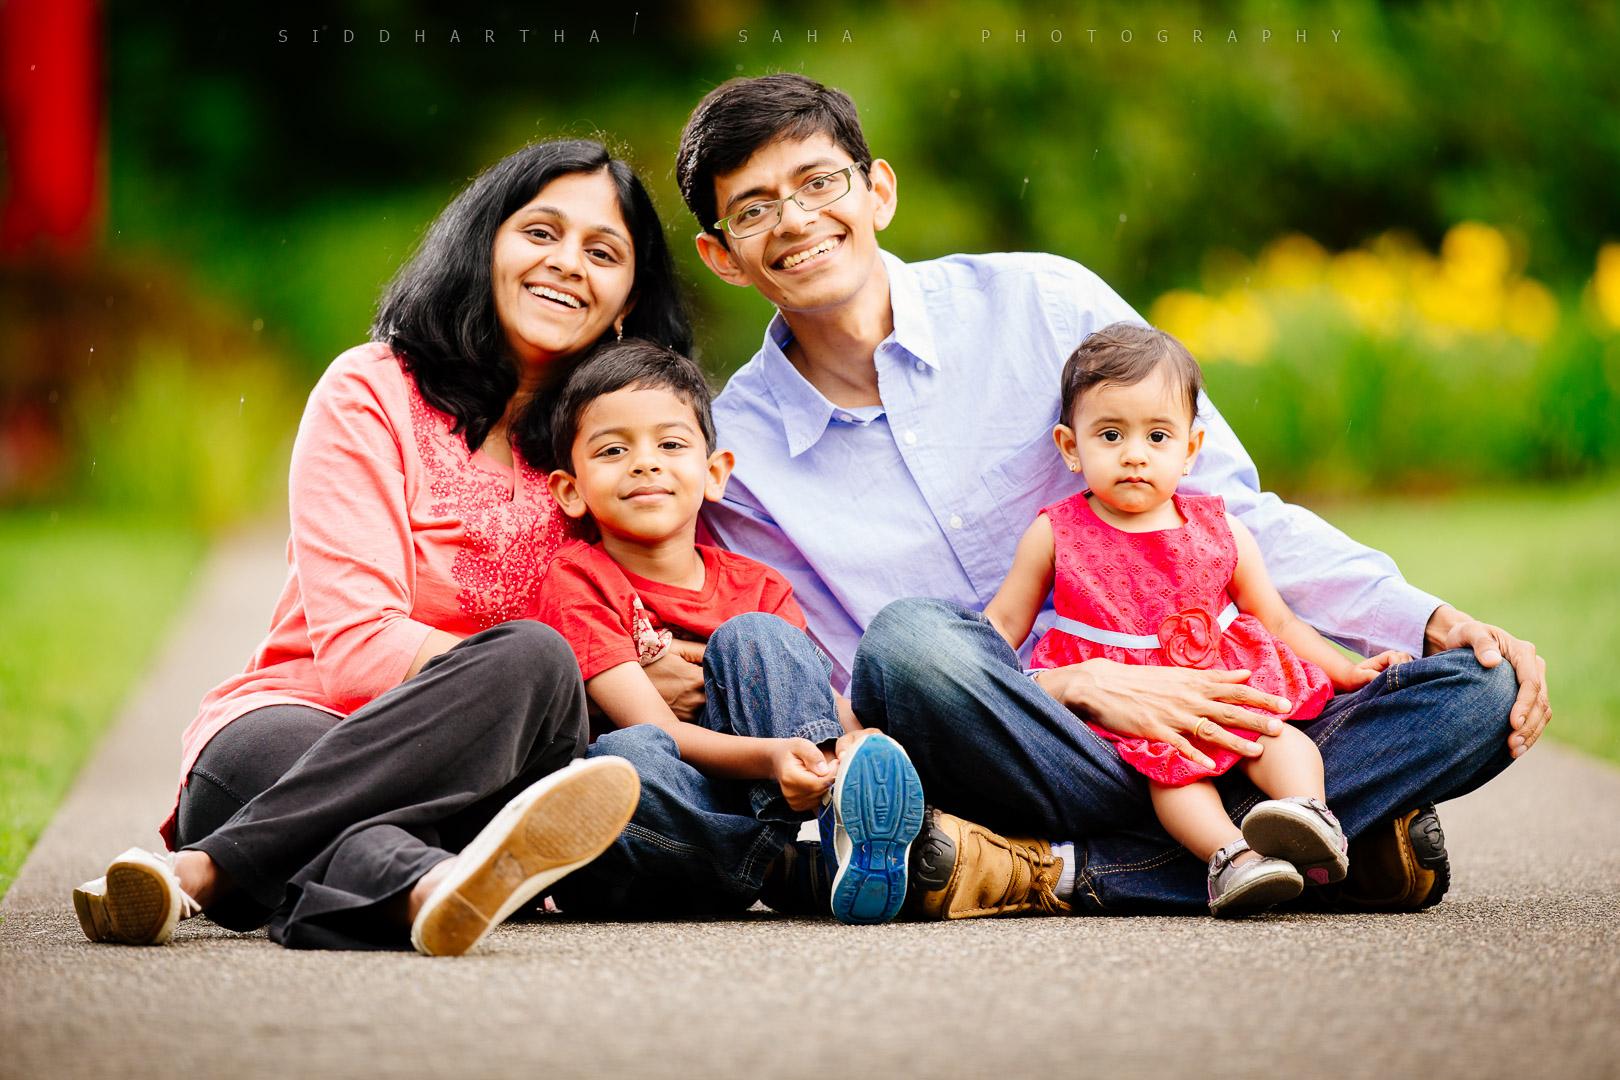 2015-08-08 - Padmaja Ketan Family Photoshoot - _05Y8832